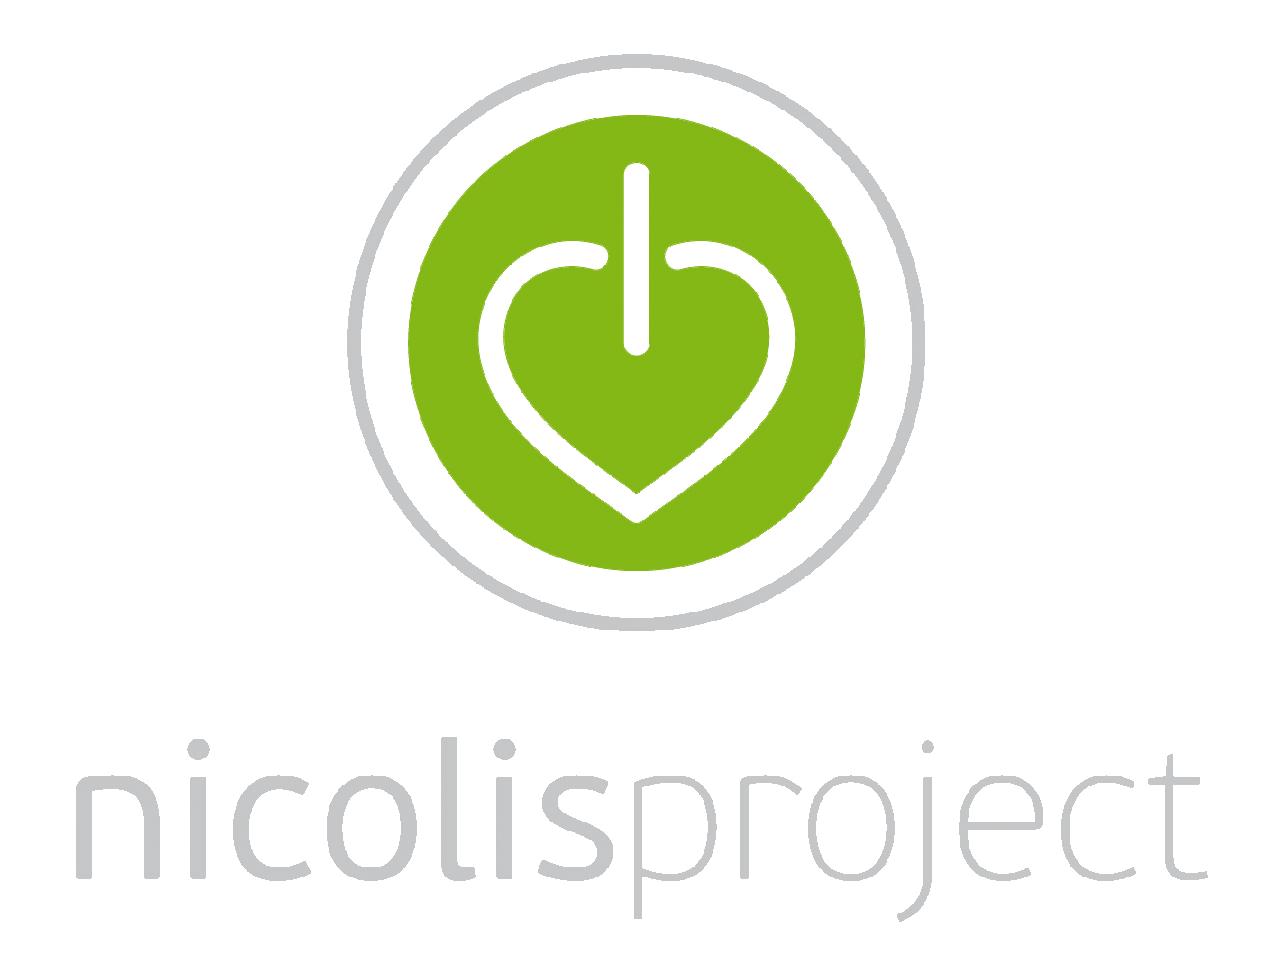 http://www.nicolisproject.com/